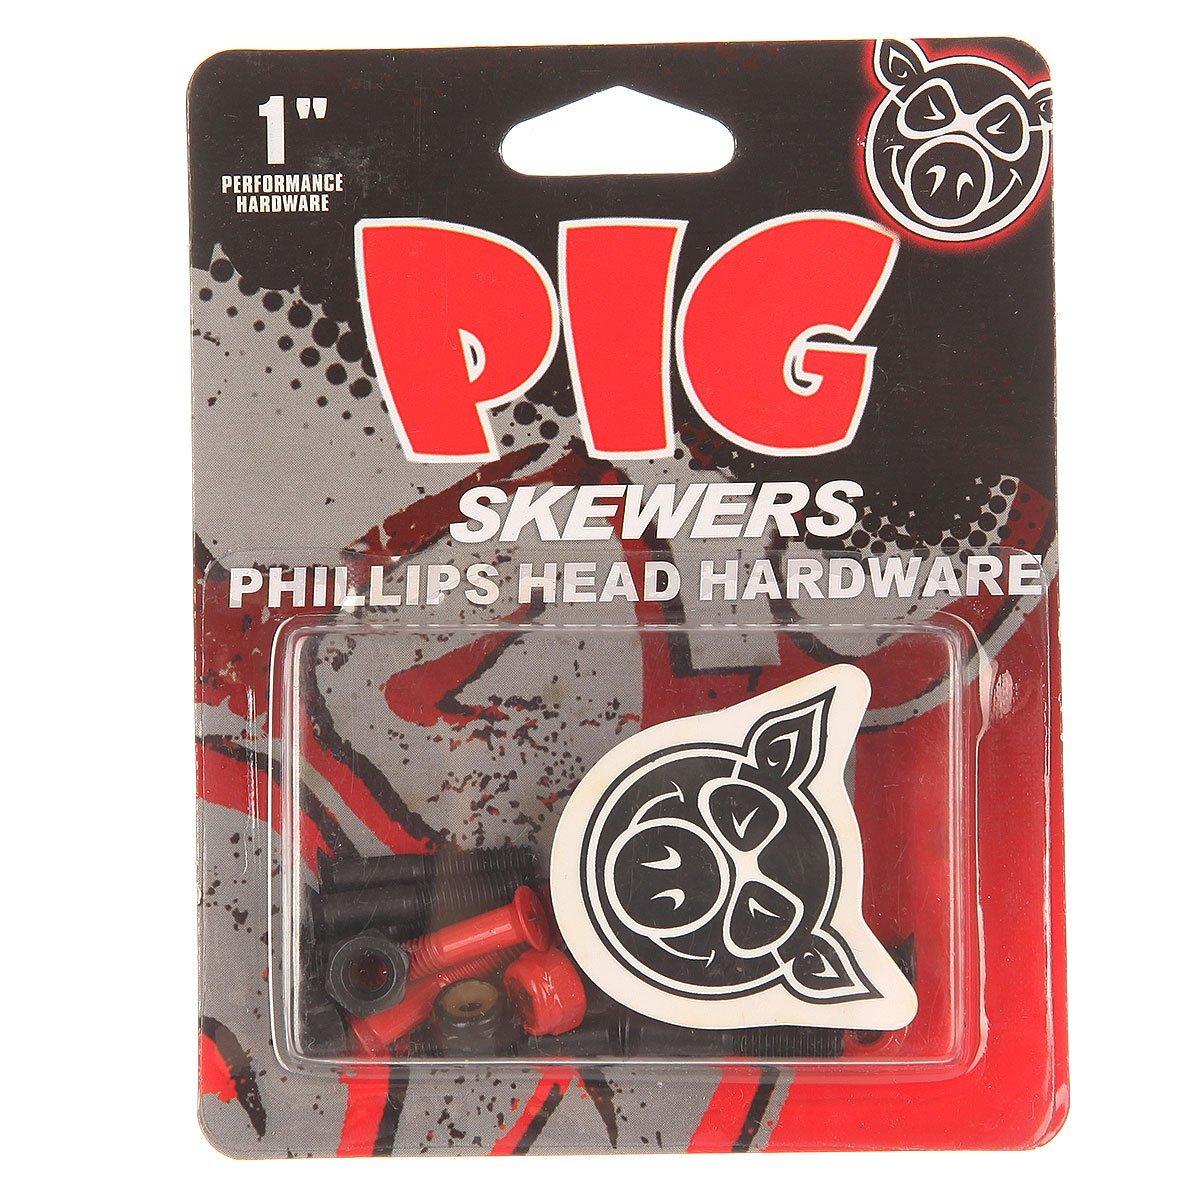 Болты для скейтборда PIG Red Skewers Phillips